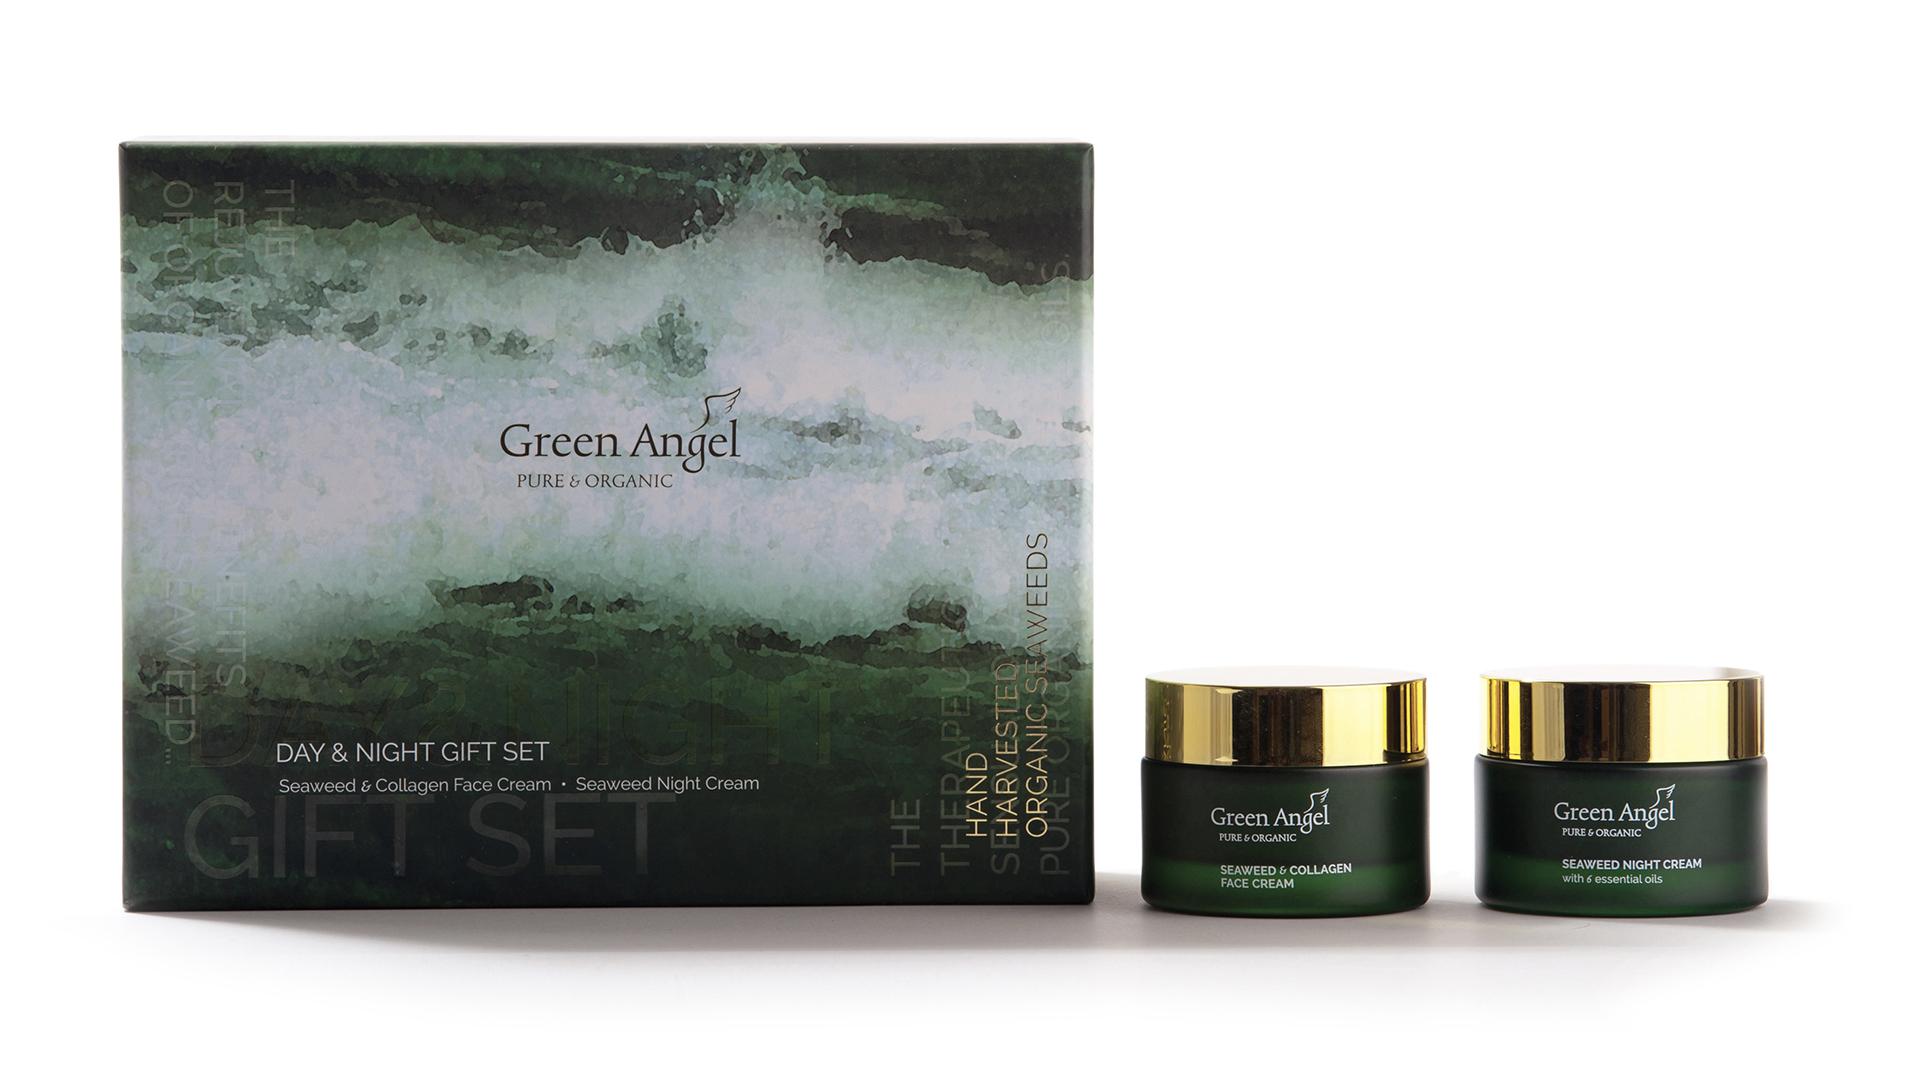 Galentine's Day Gift - Green Angel Day & Night Gift Set